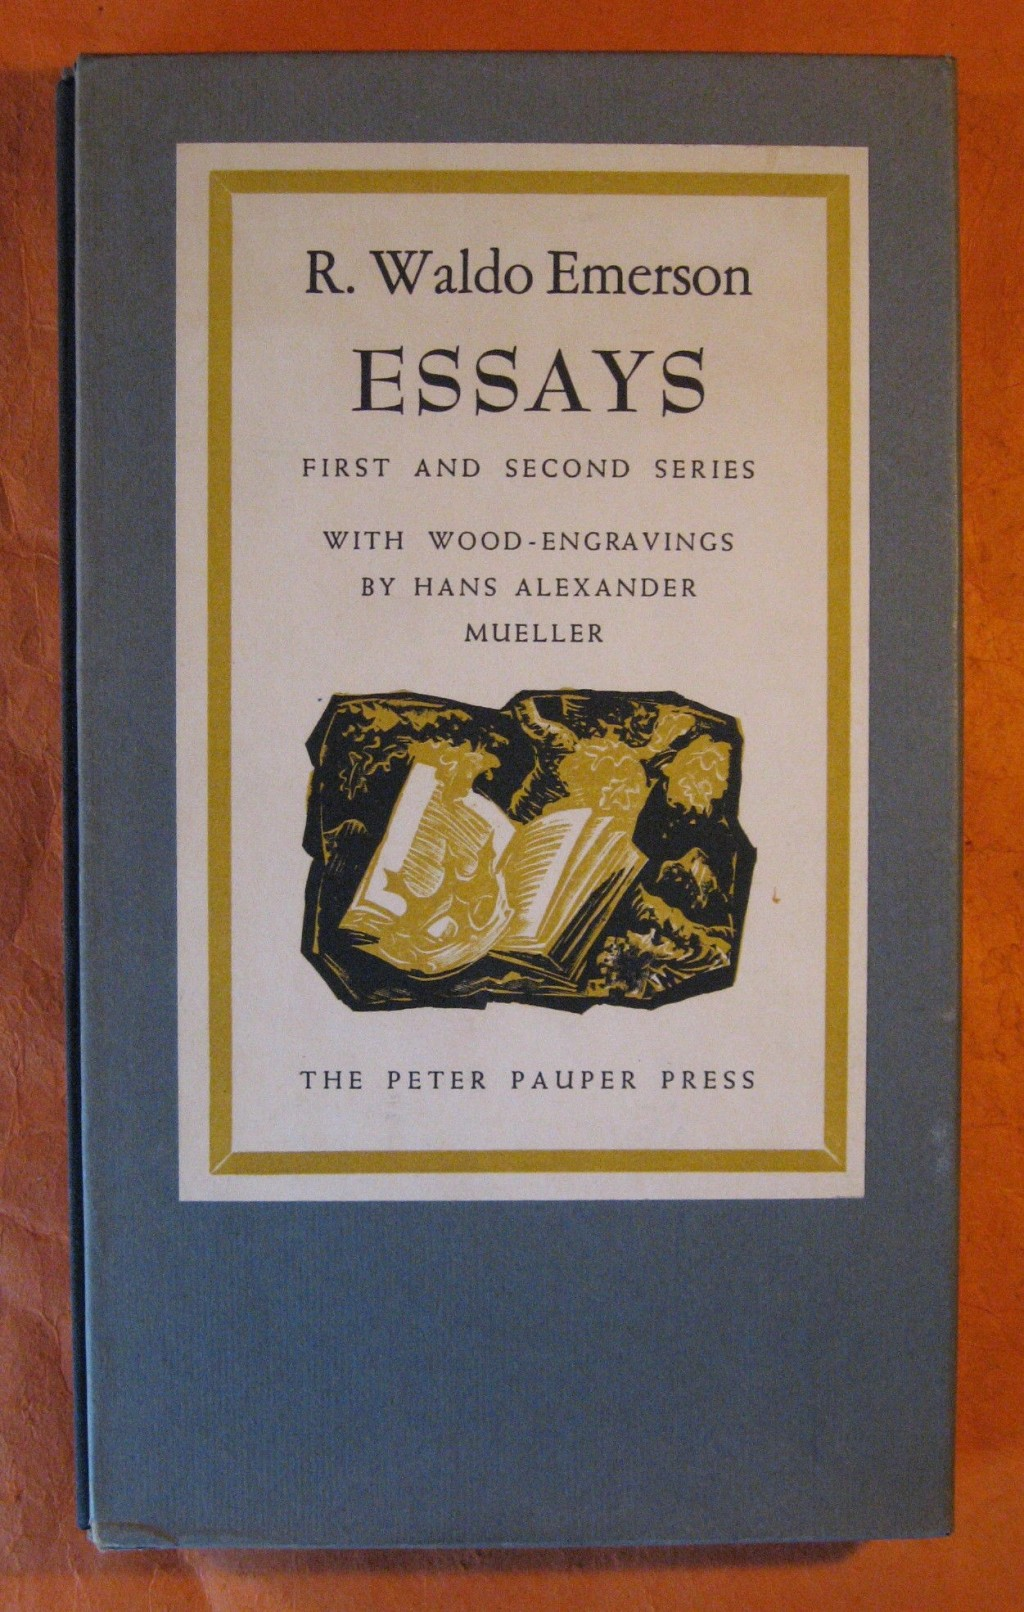 012 Essays First Series X Essay Stunning Emerson Pdf Shelburne Publisher Large